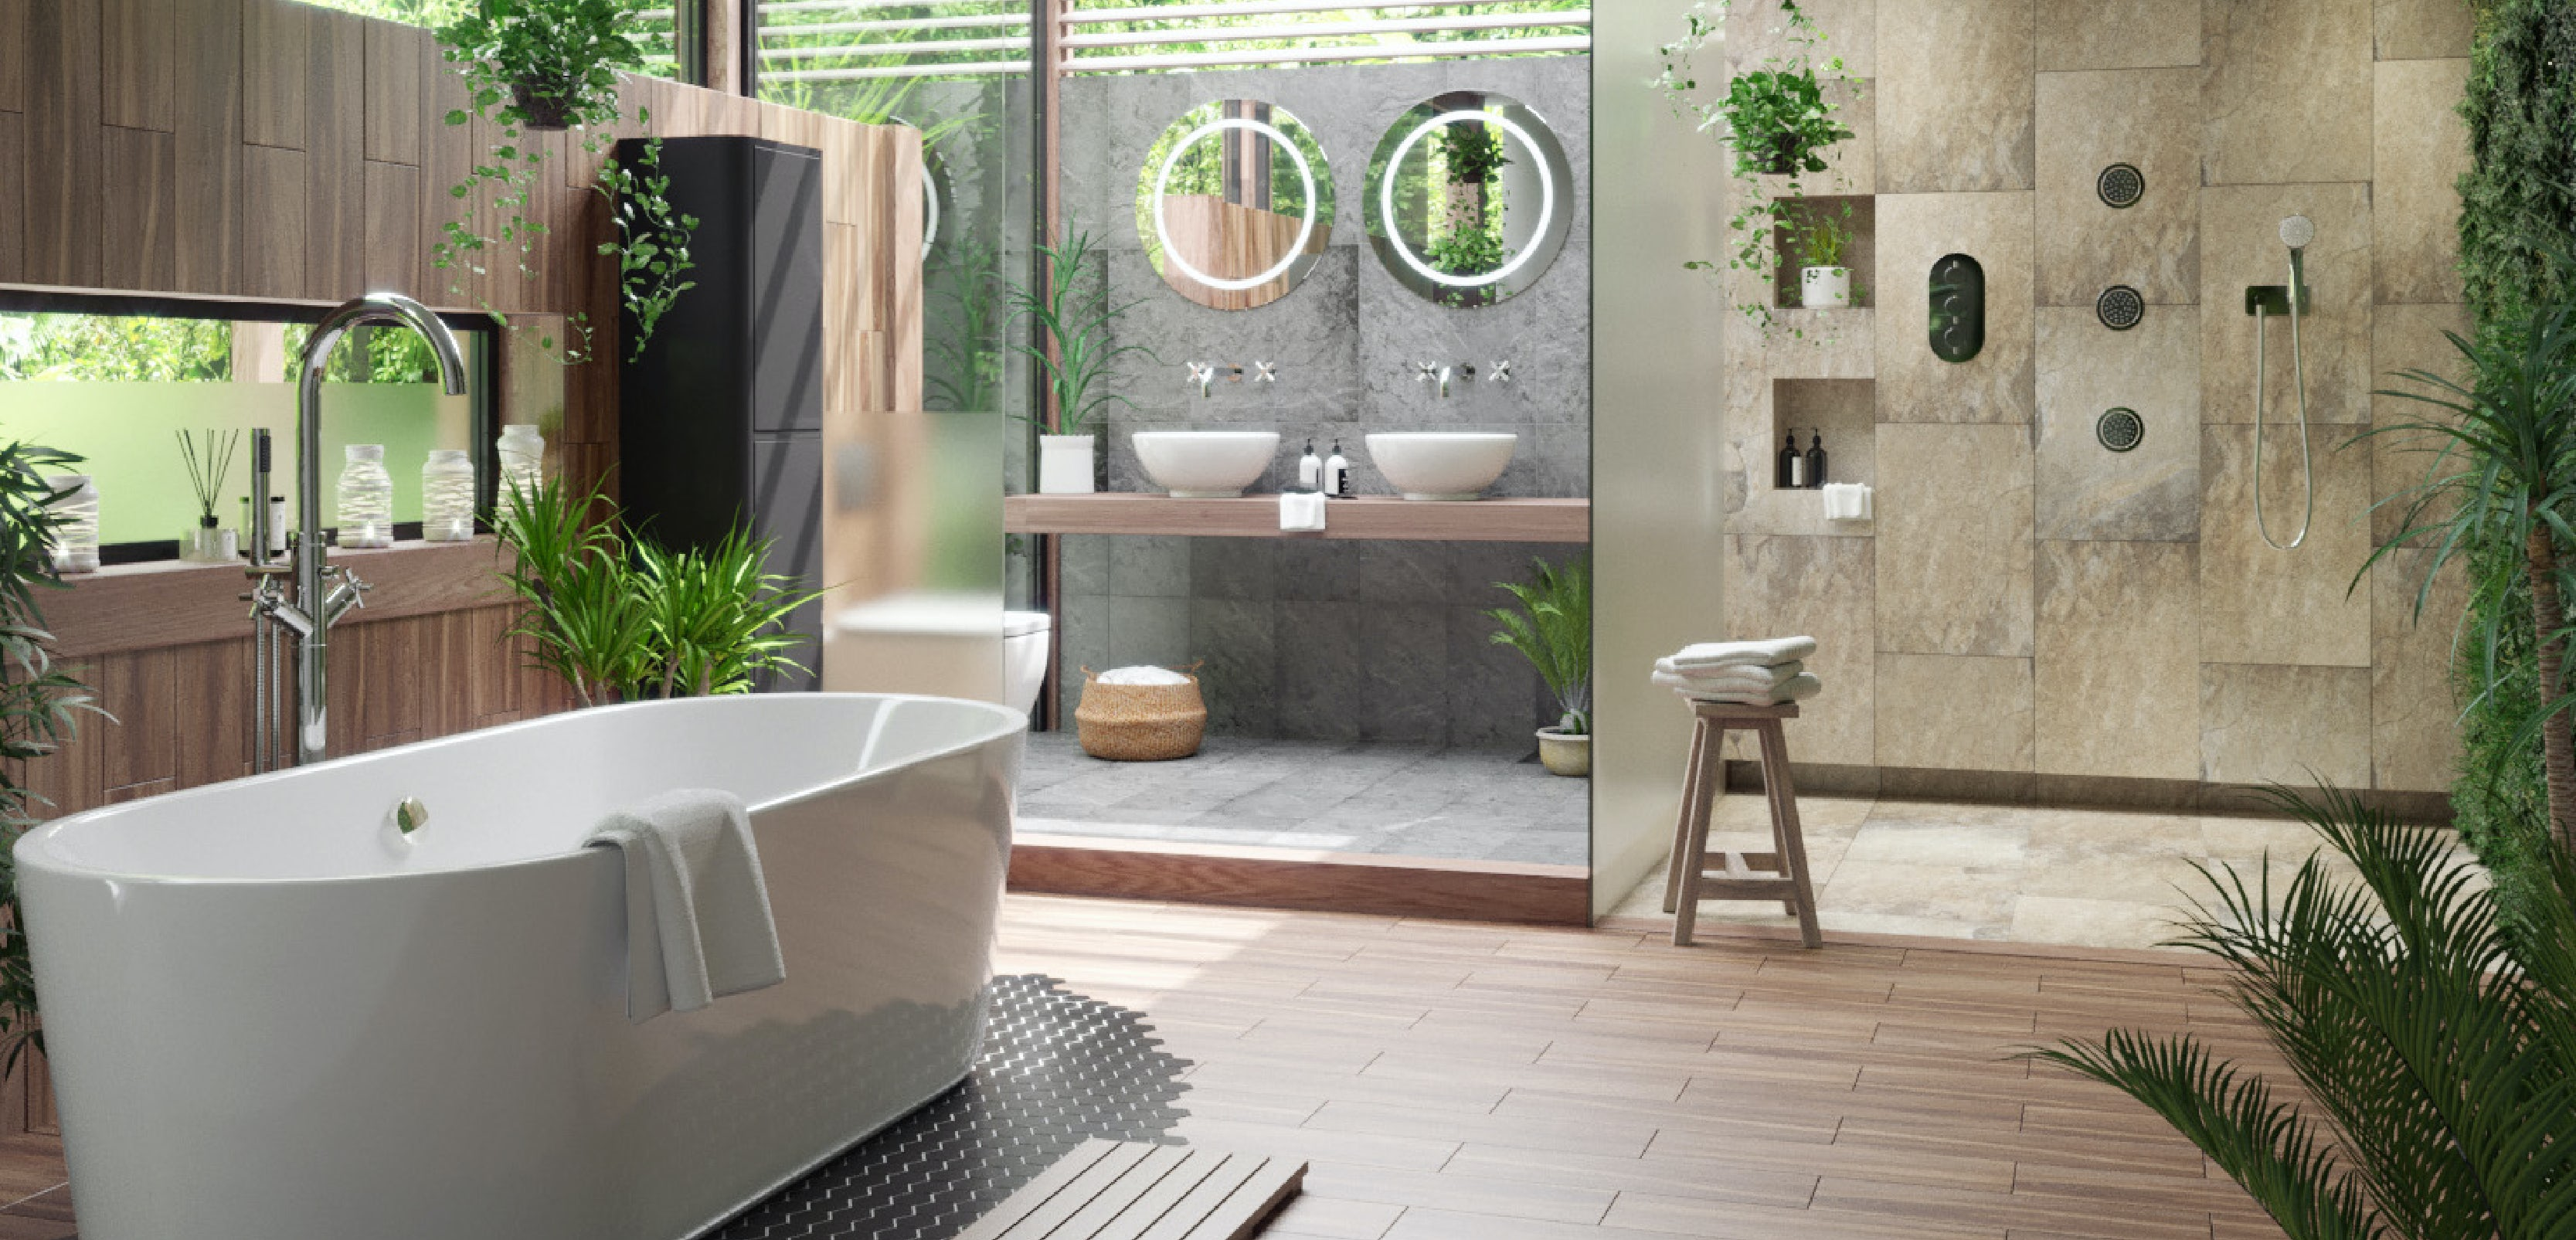 Get The Look: Tropical Bathrooms